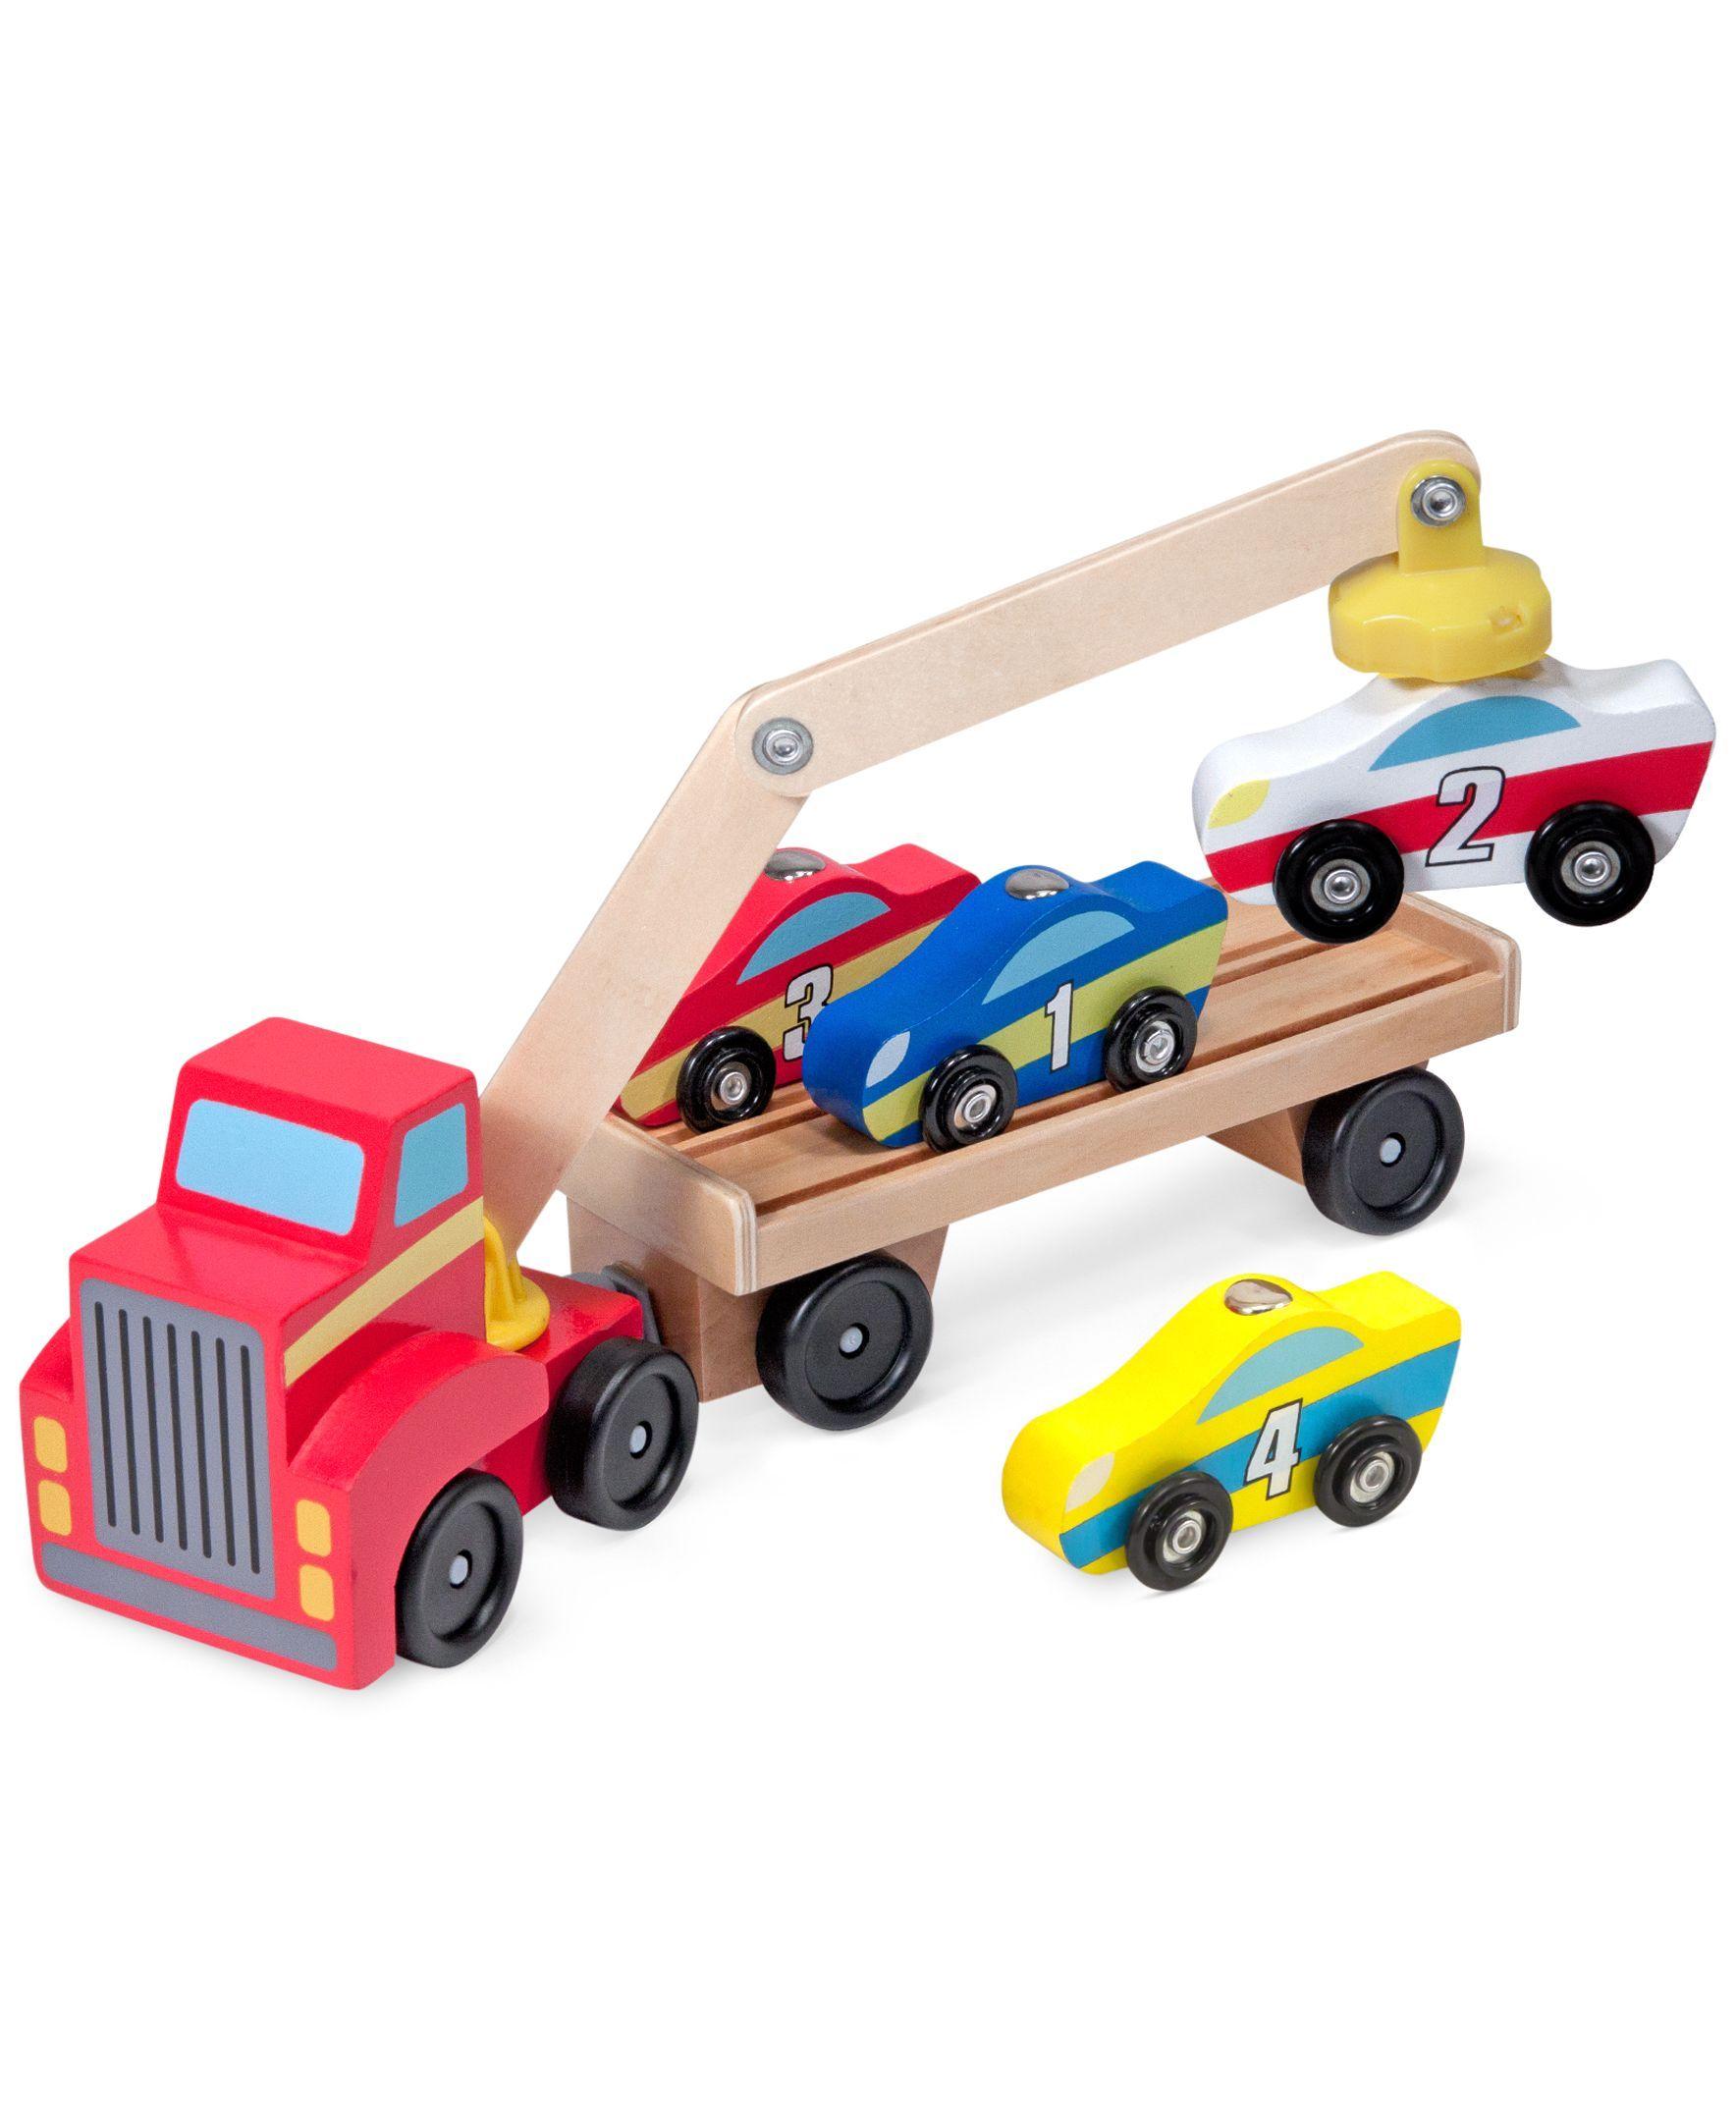 Baby girl car toys  Kidsu Magnetic Car Loader Toy  Averyus Wish List  Pinterest  Toy